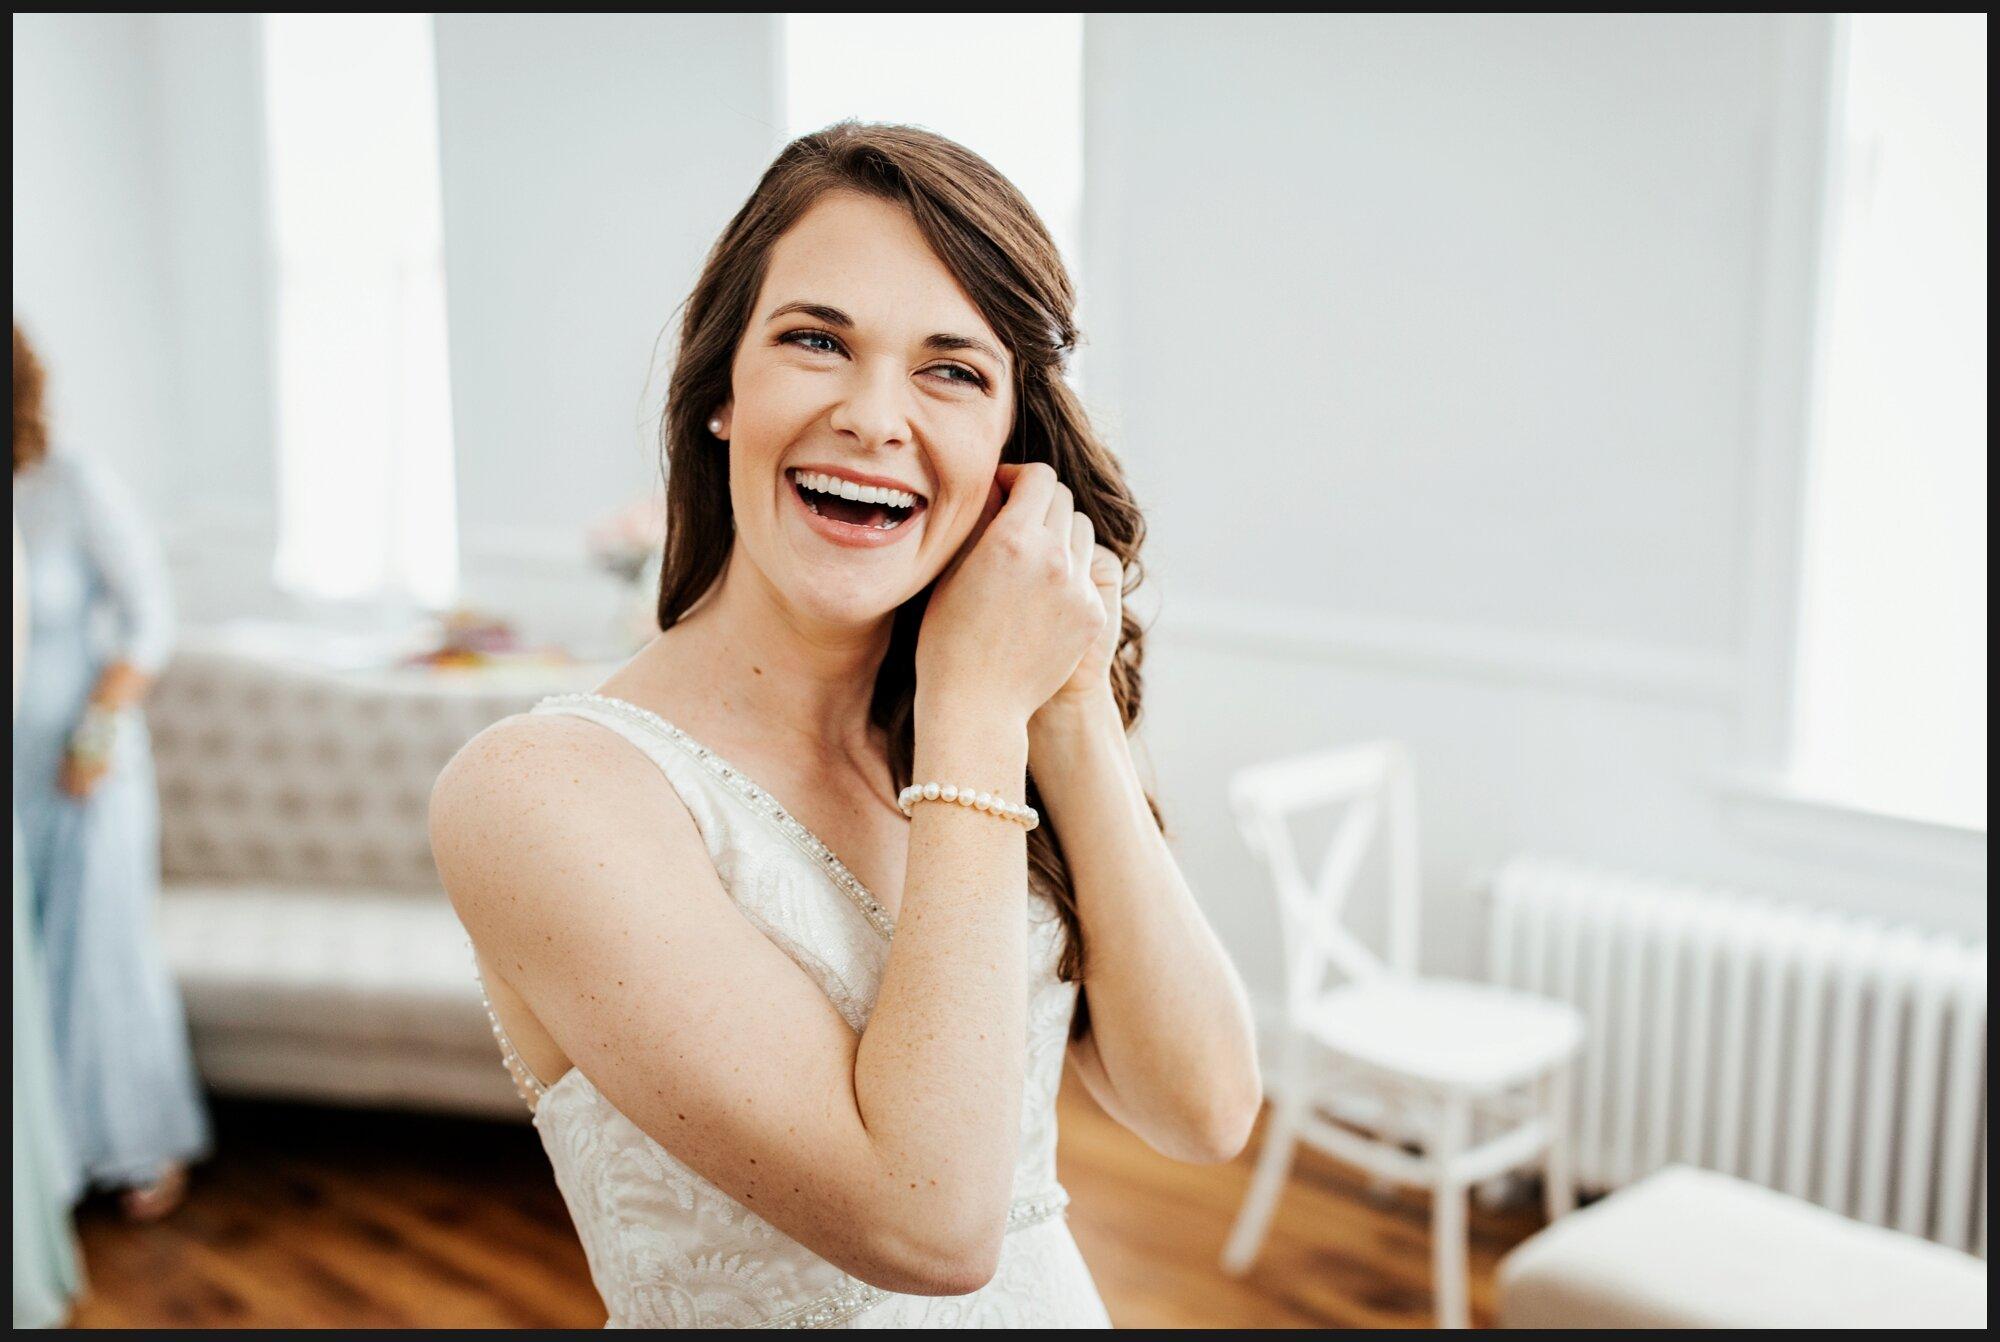 Orlando-Wedding-Photographer-destination-wedding-photographer-florida-wedding-photographer-hawaii-wedding-photographer_0655.jpg